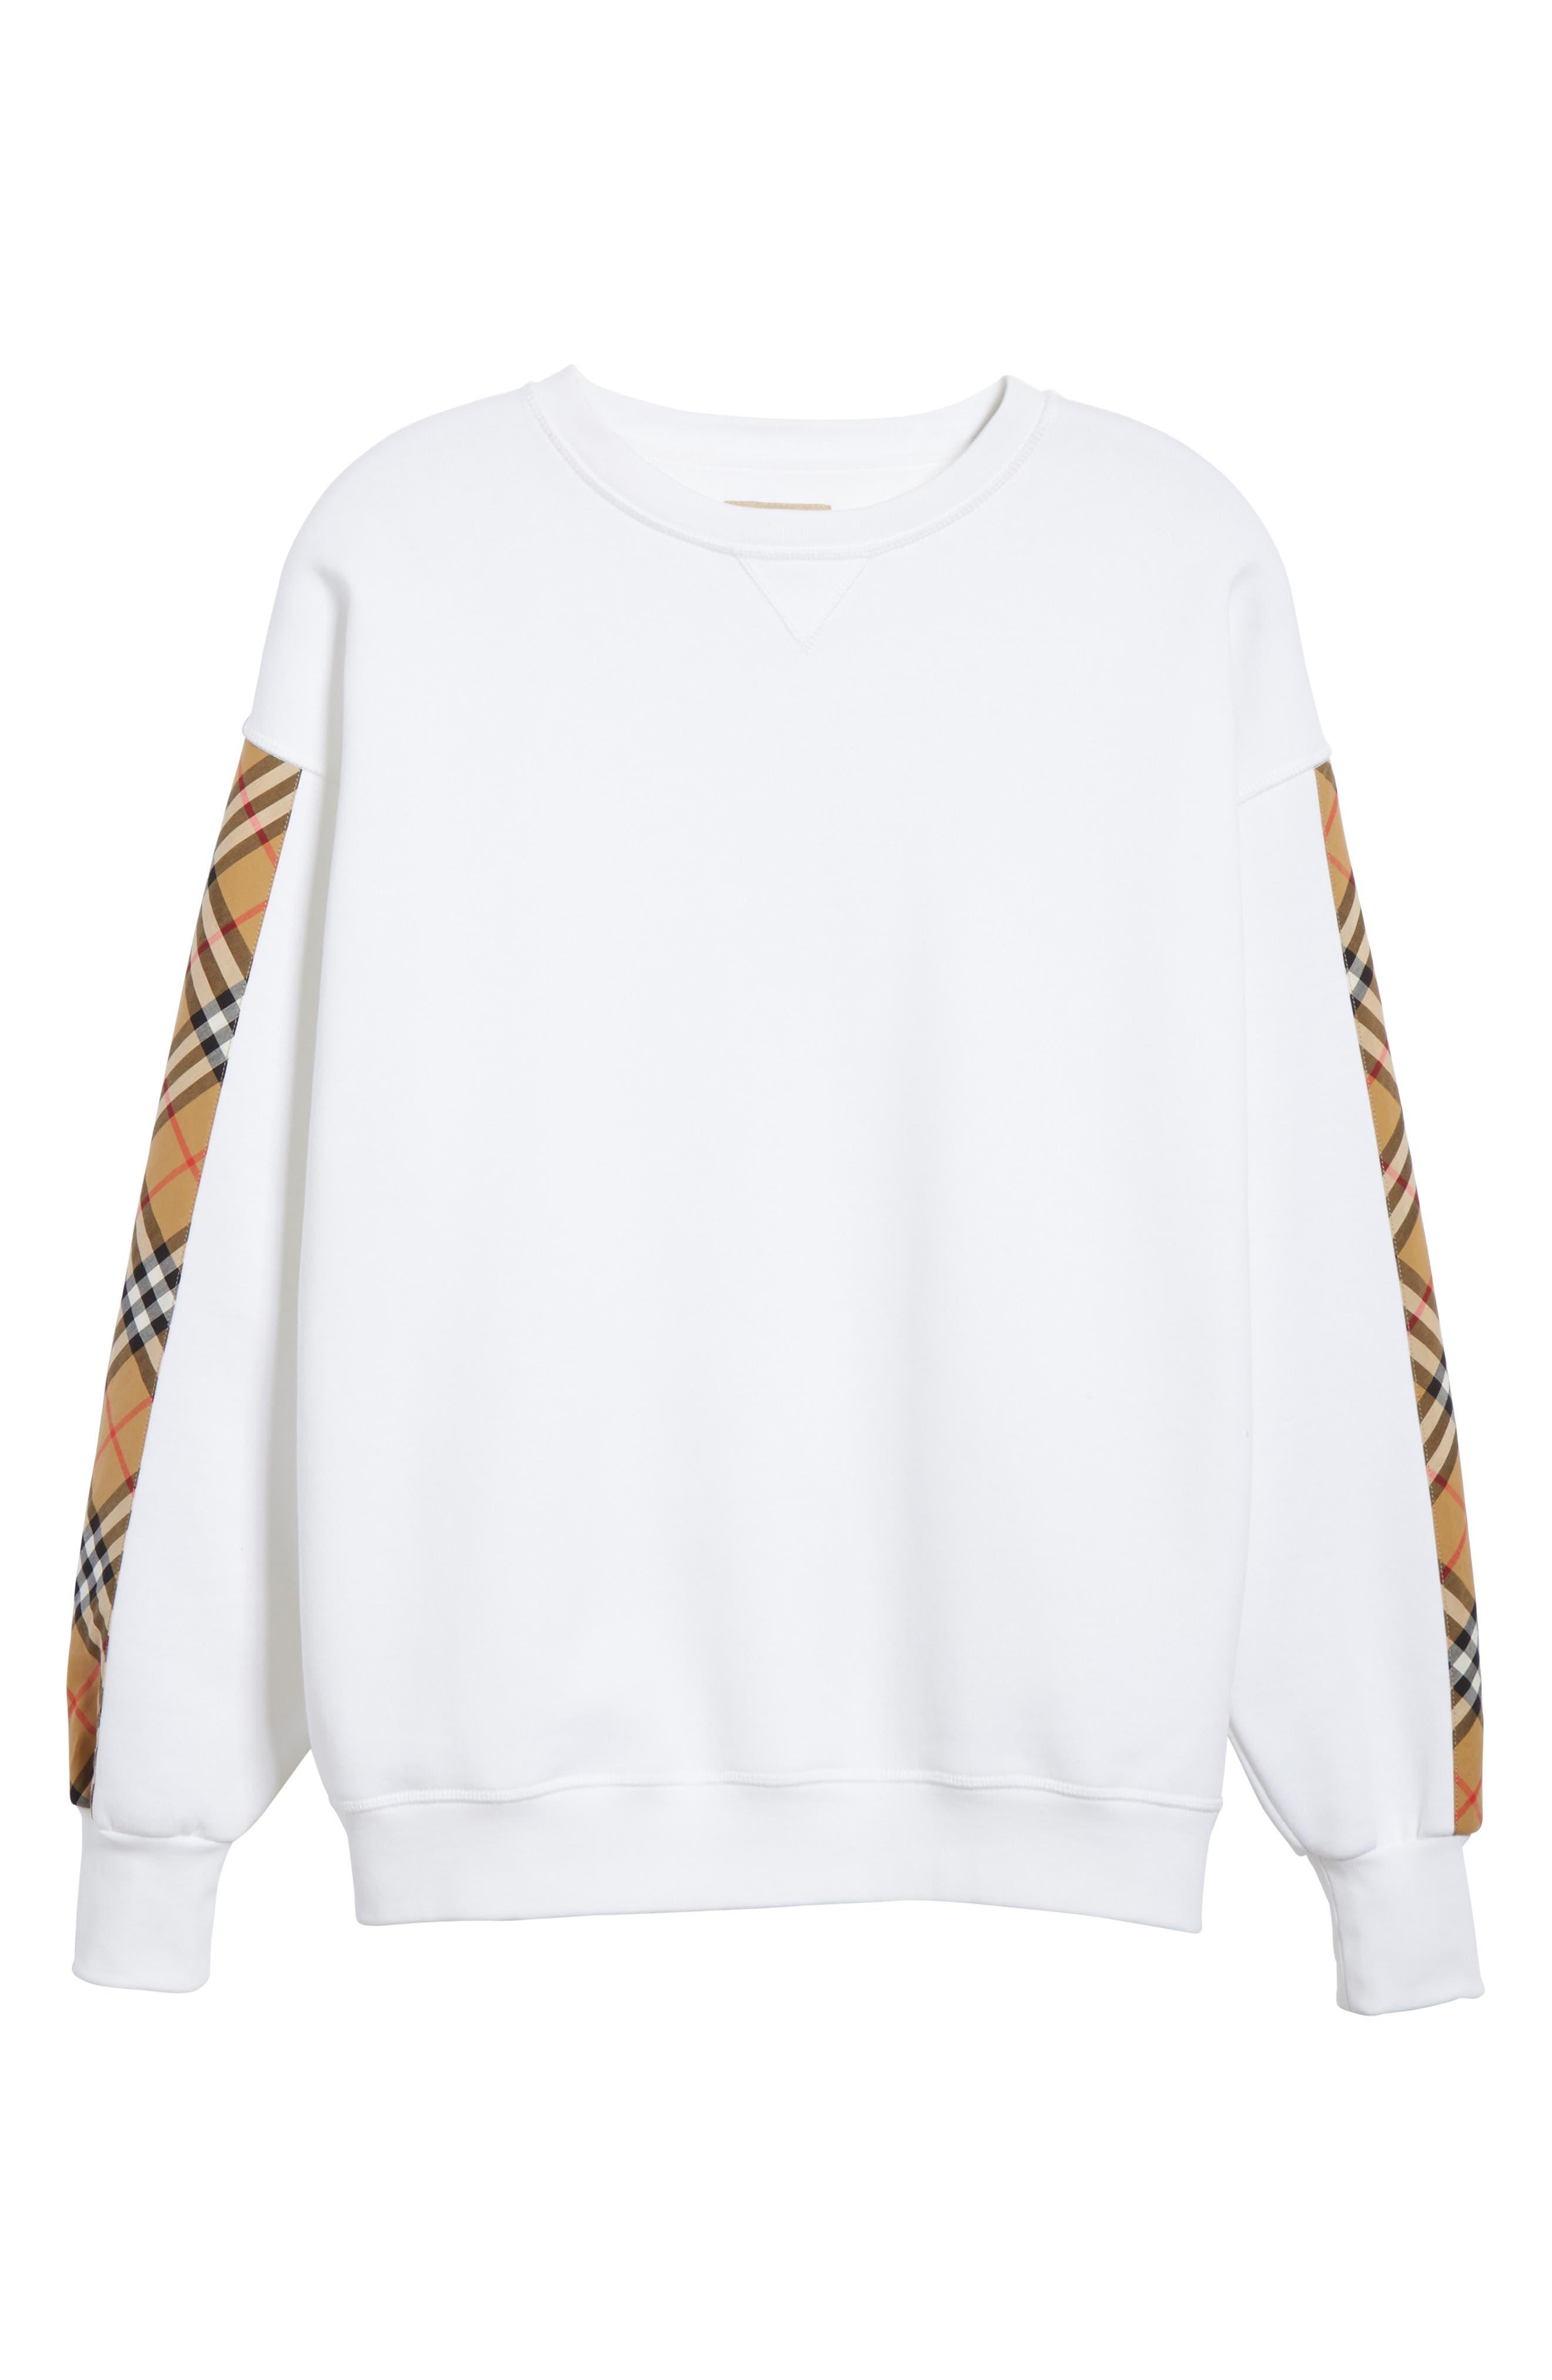 Bronx Check Sleeve Sweatshirt,                             Alternate thumbnail 6, color,                             WHITE